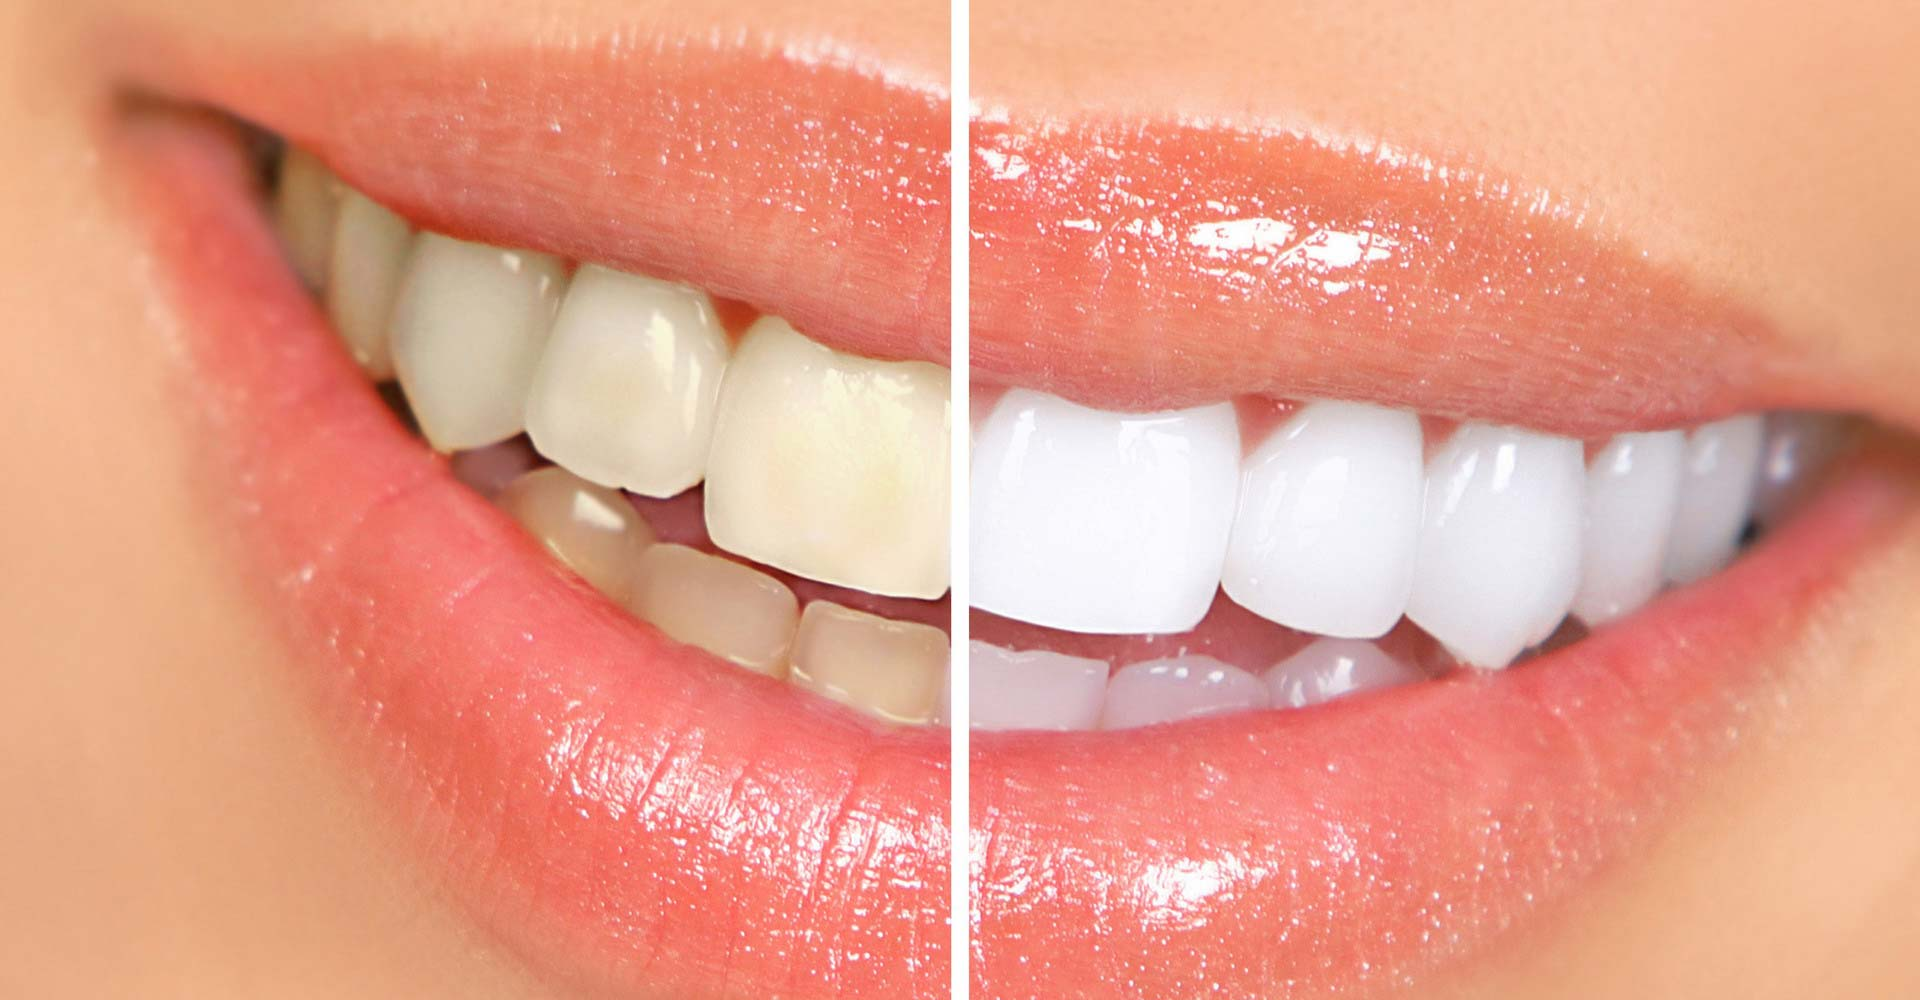 Odontoiatra Ferrara Dentista Ferrara Studio Odontoiatrico Dott. Nicola Mobilio Prestazioni Sbiancamento dei Denti